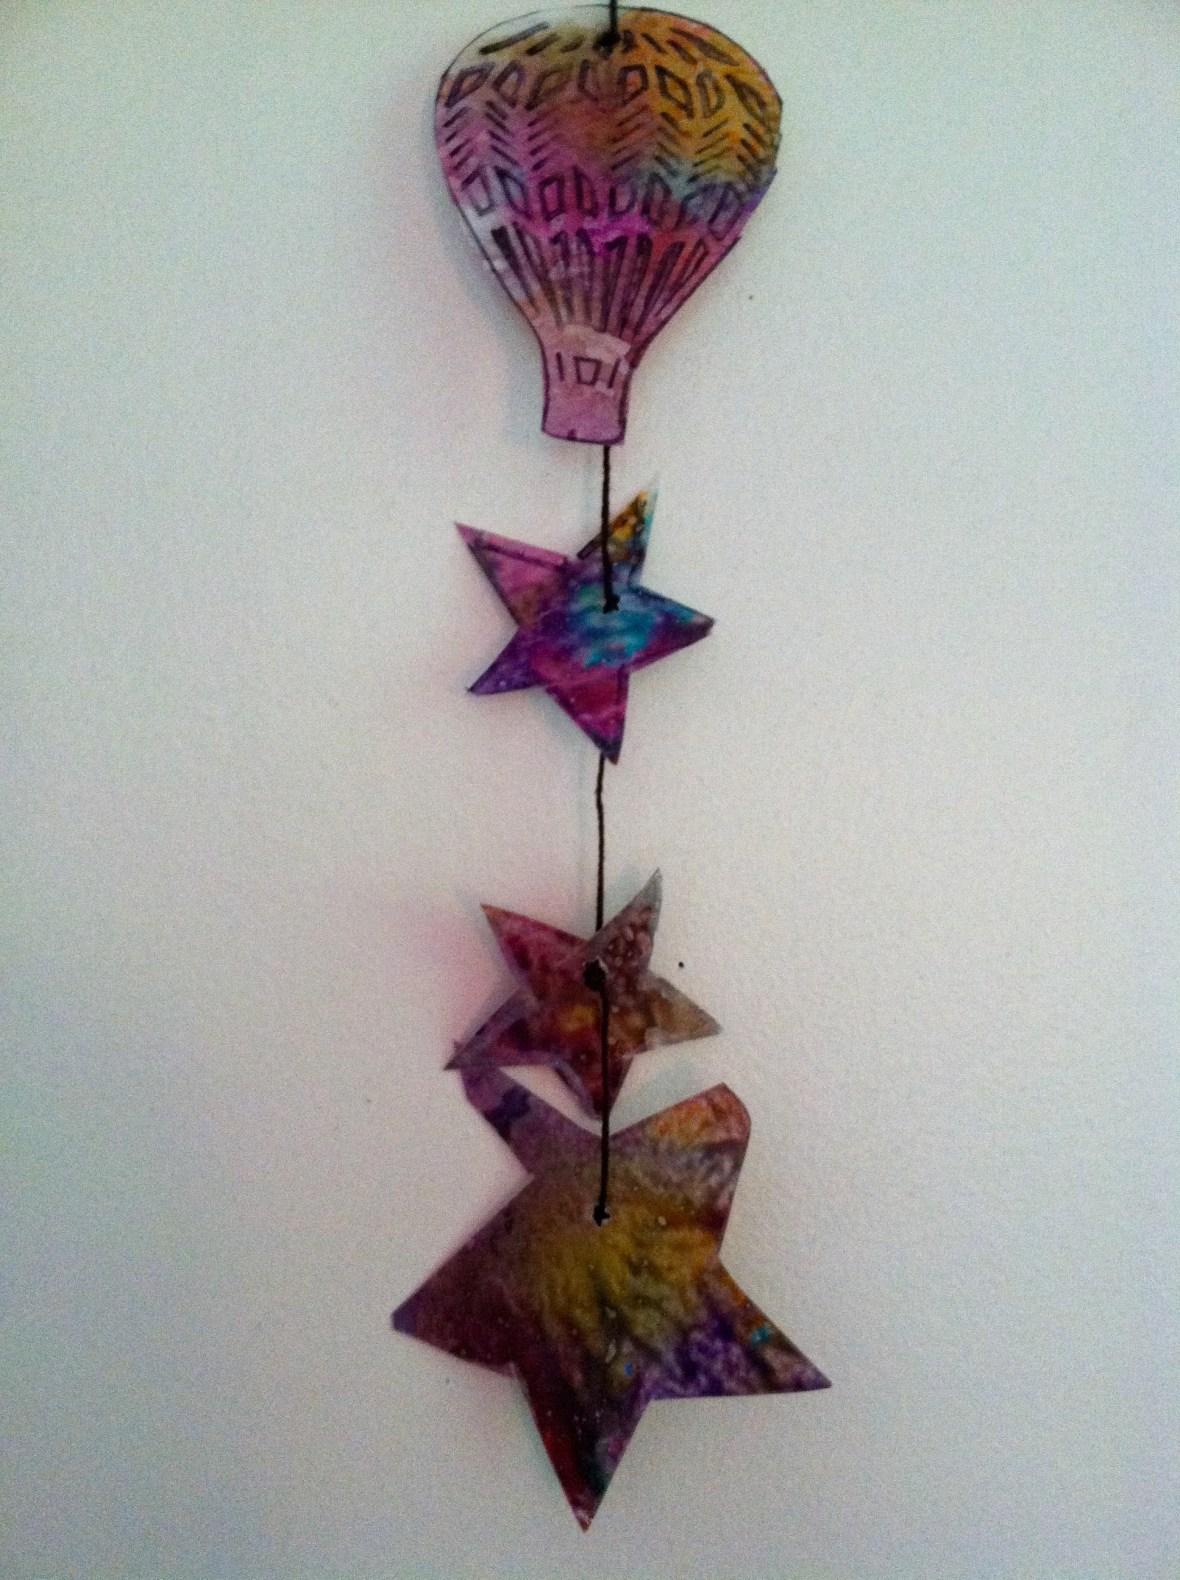 Close up balloon + Stars